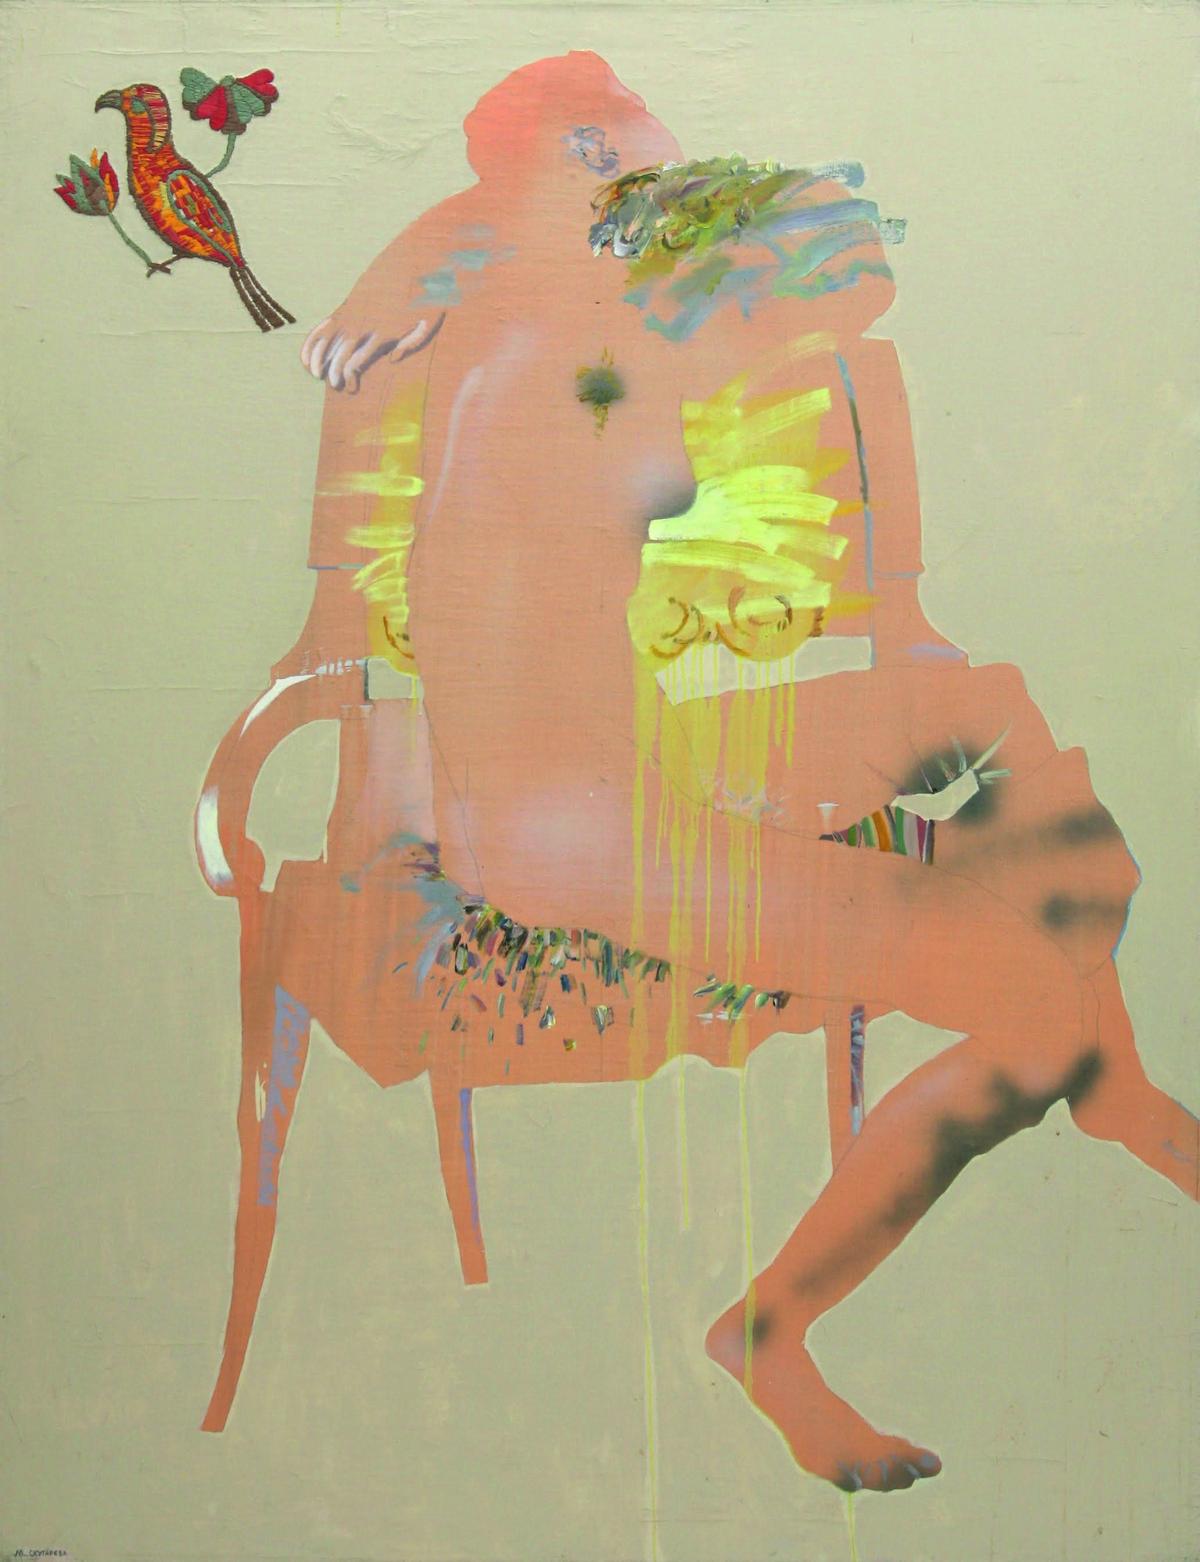 Картина Марины Скугаревой «Попугай» (1992 г.) из коллекции Игоря Абрамовича